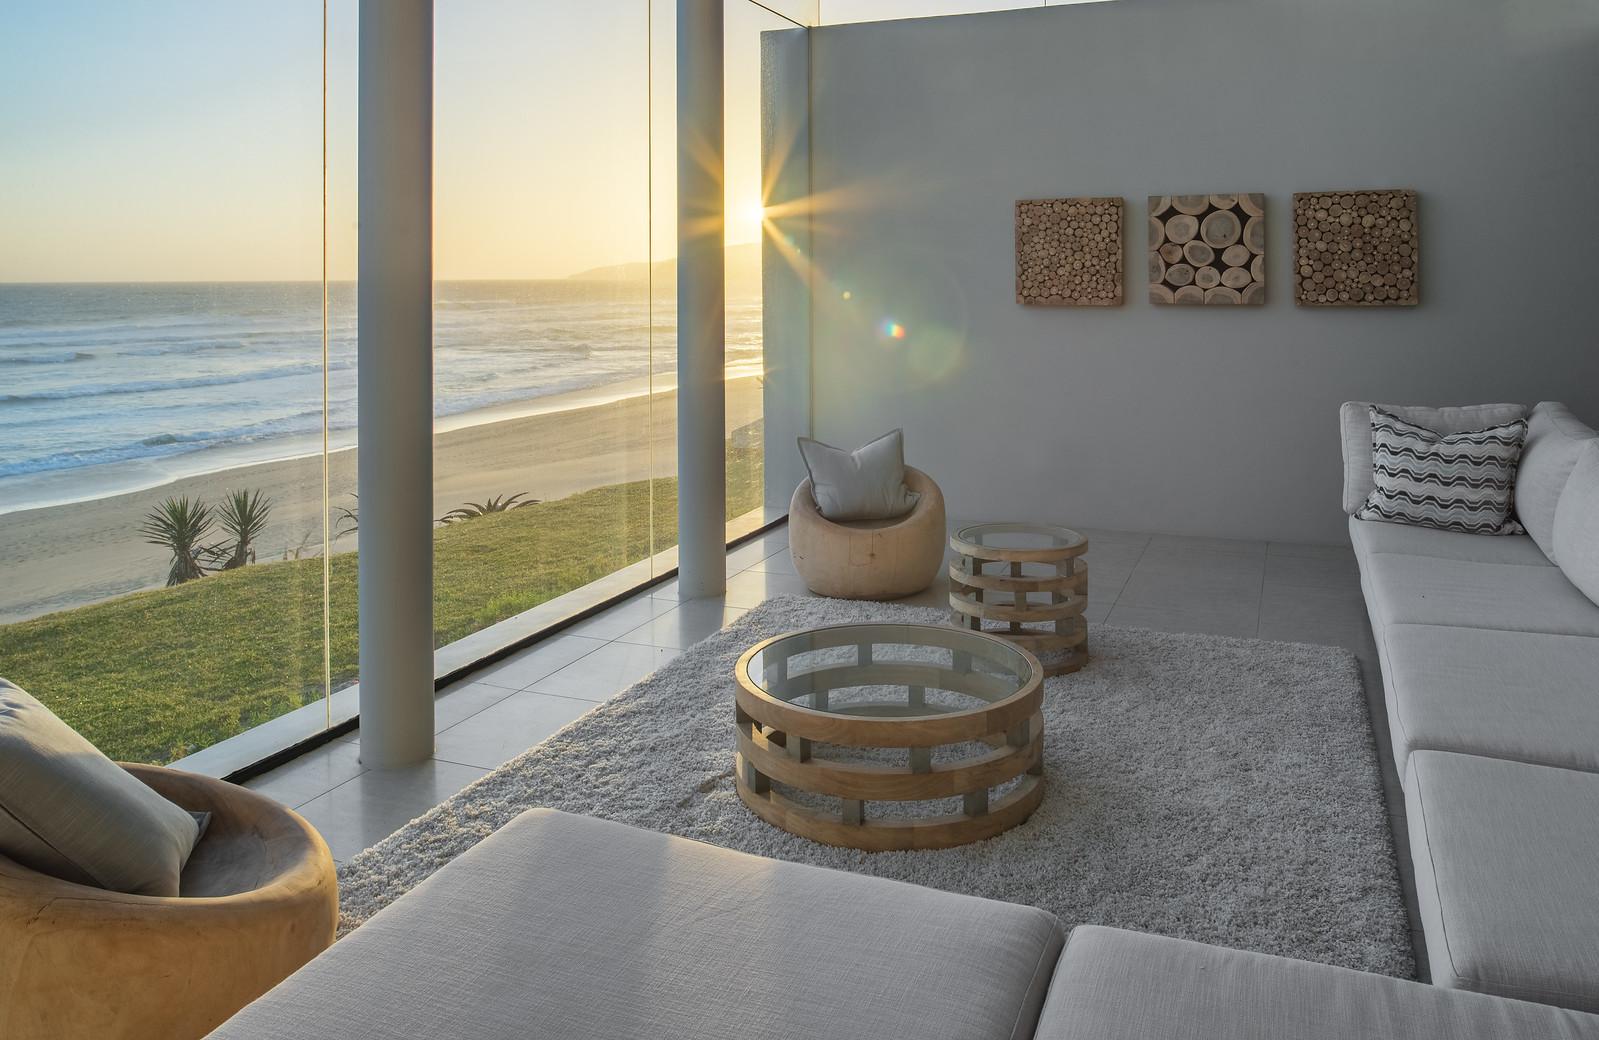 Living Room Sunset, Oceans Wilderness, South Africa 2017